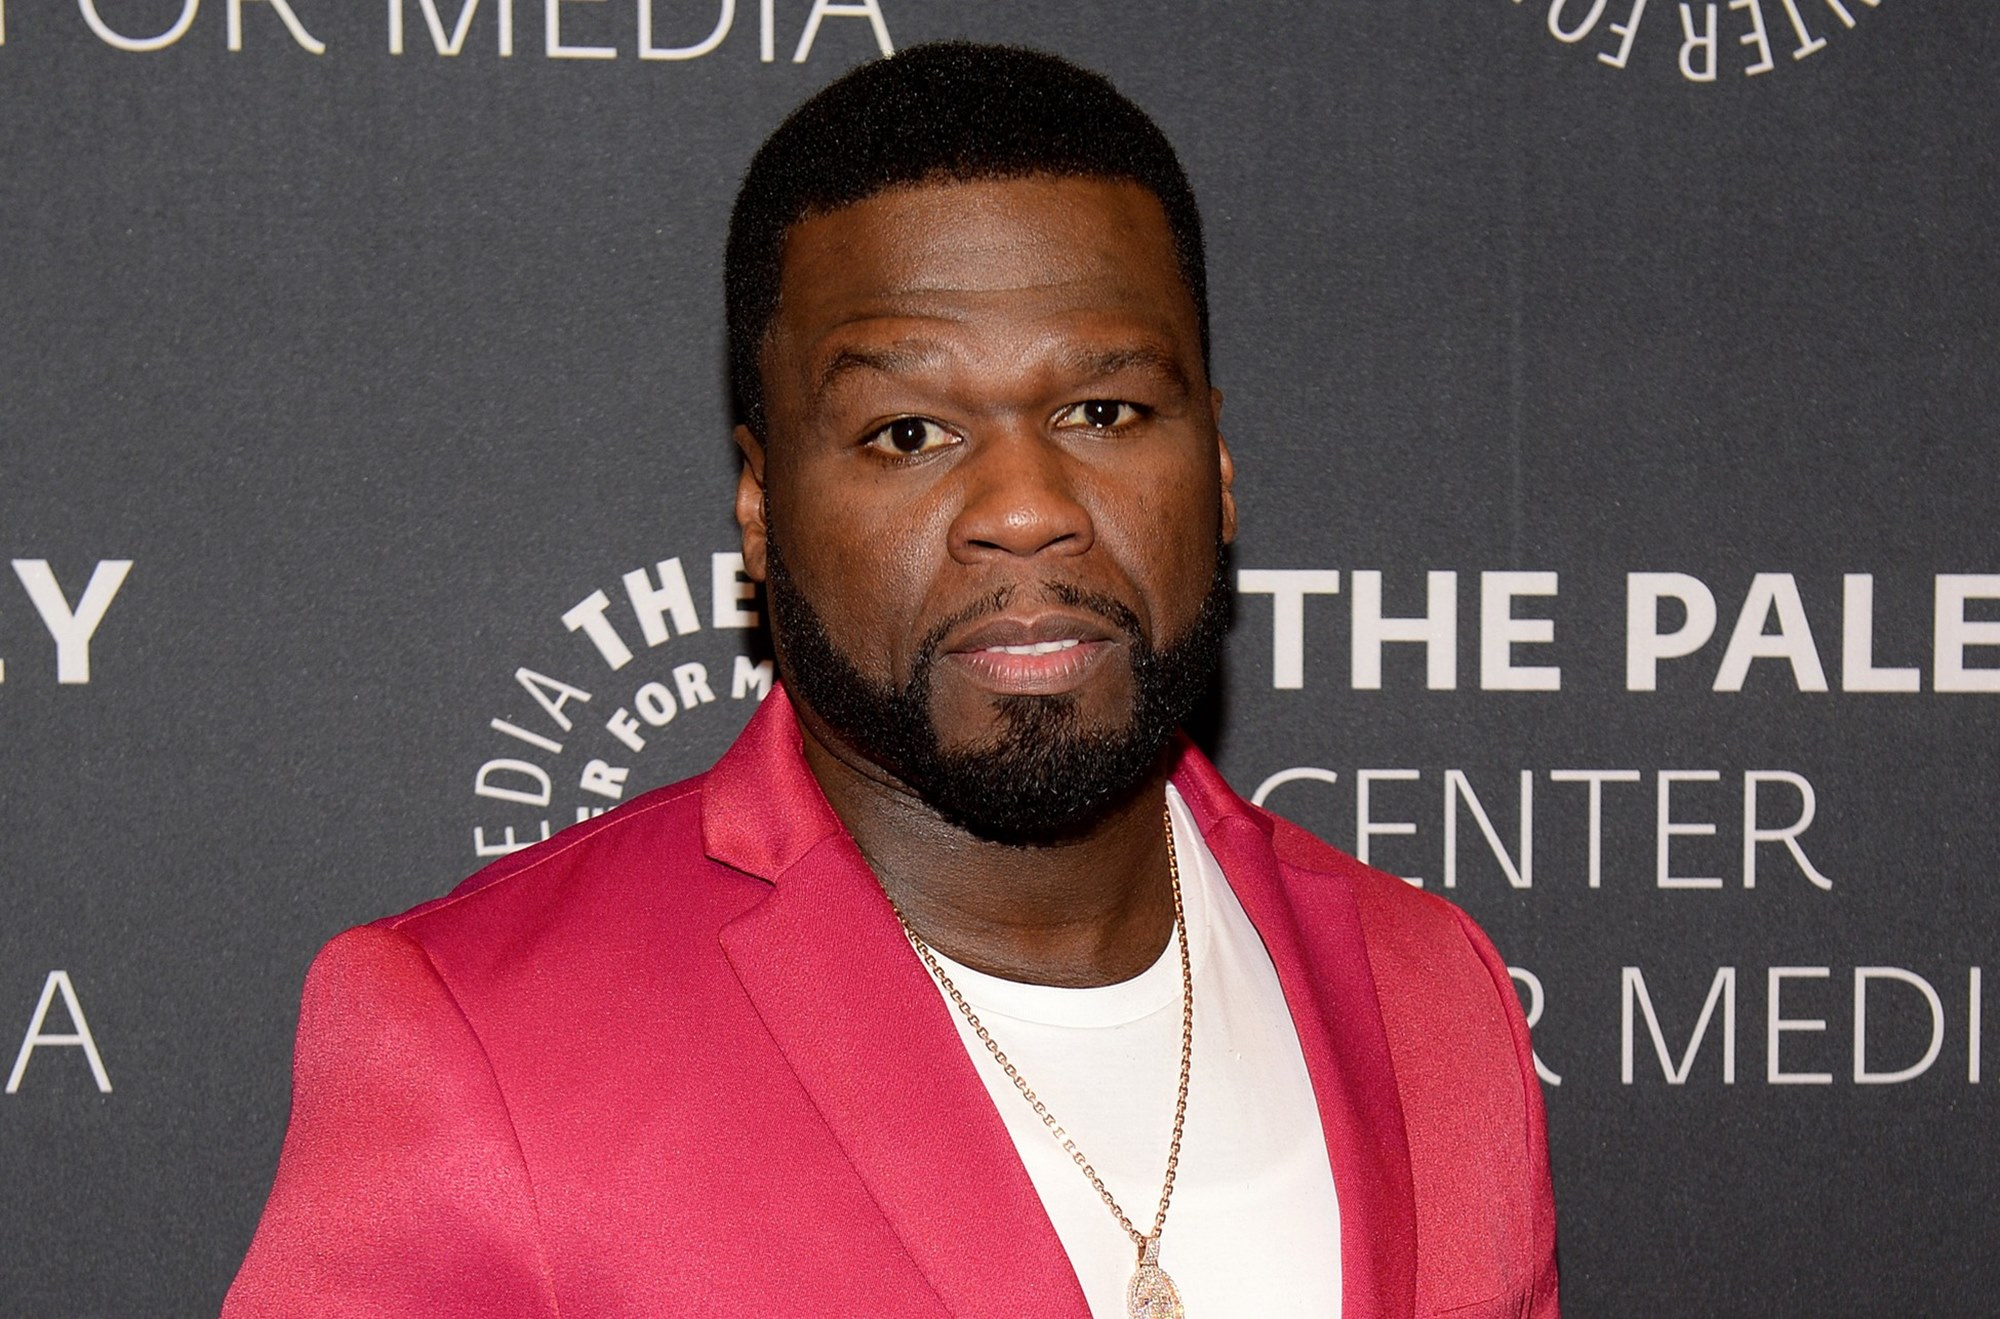 50 Cent Apologizes To Megan Thee Stallion For Joking About Shooting